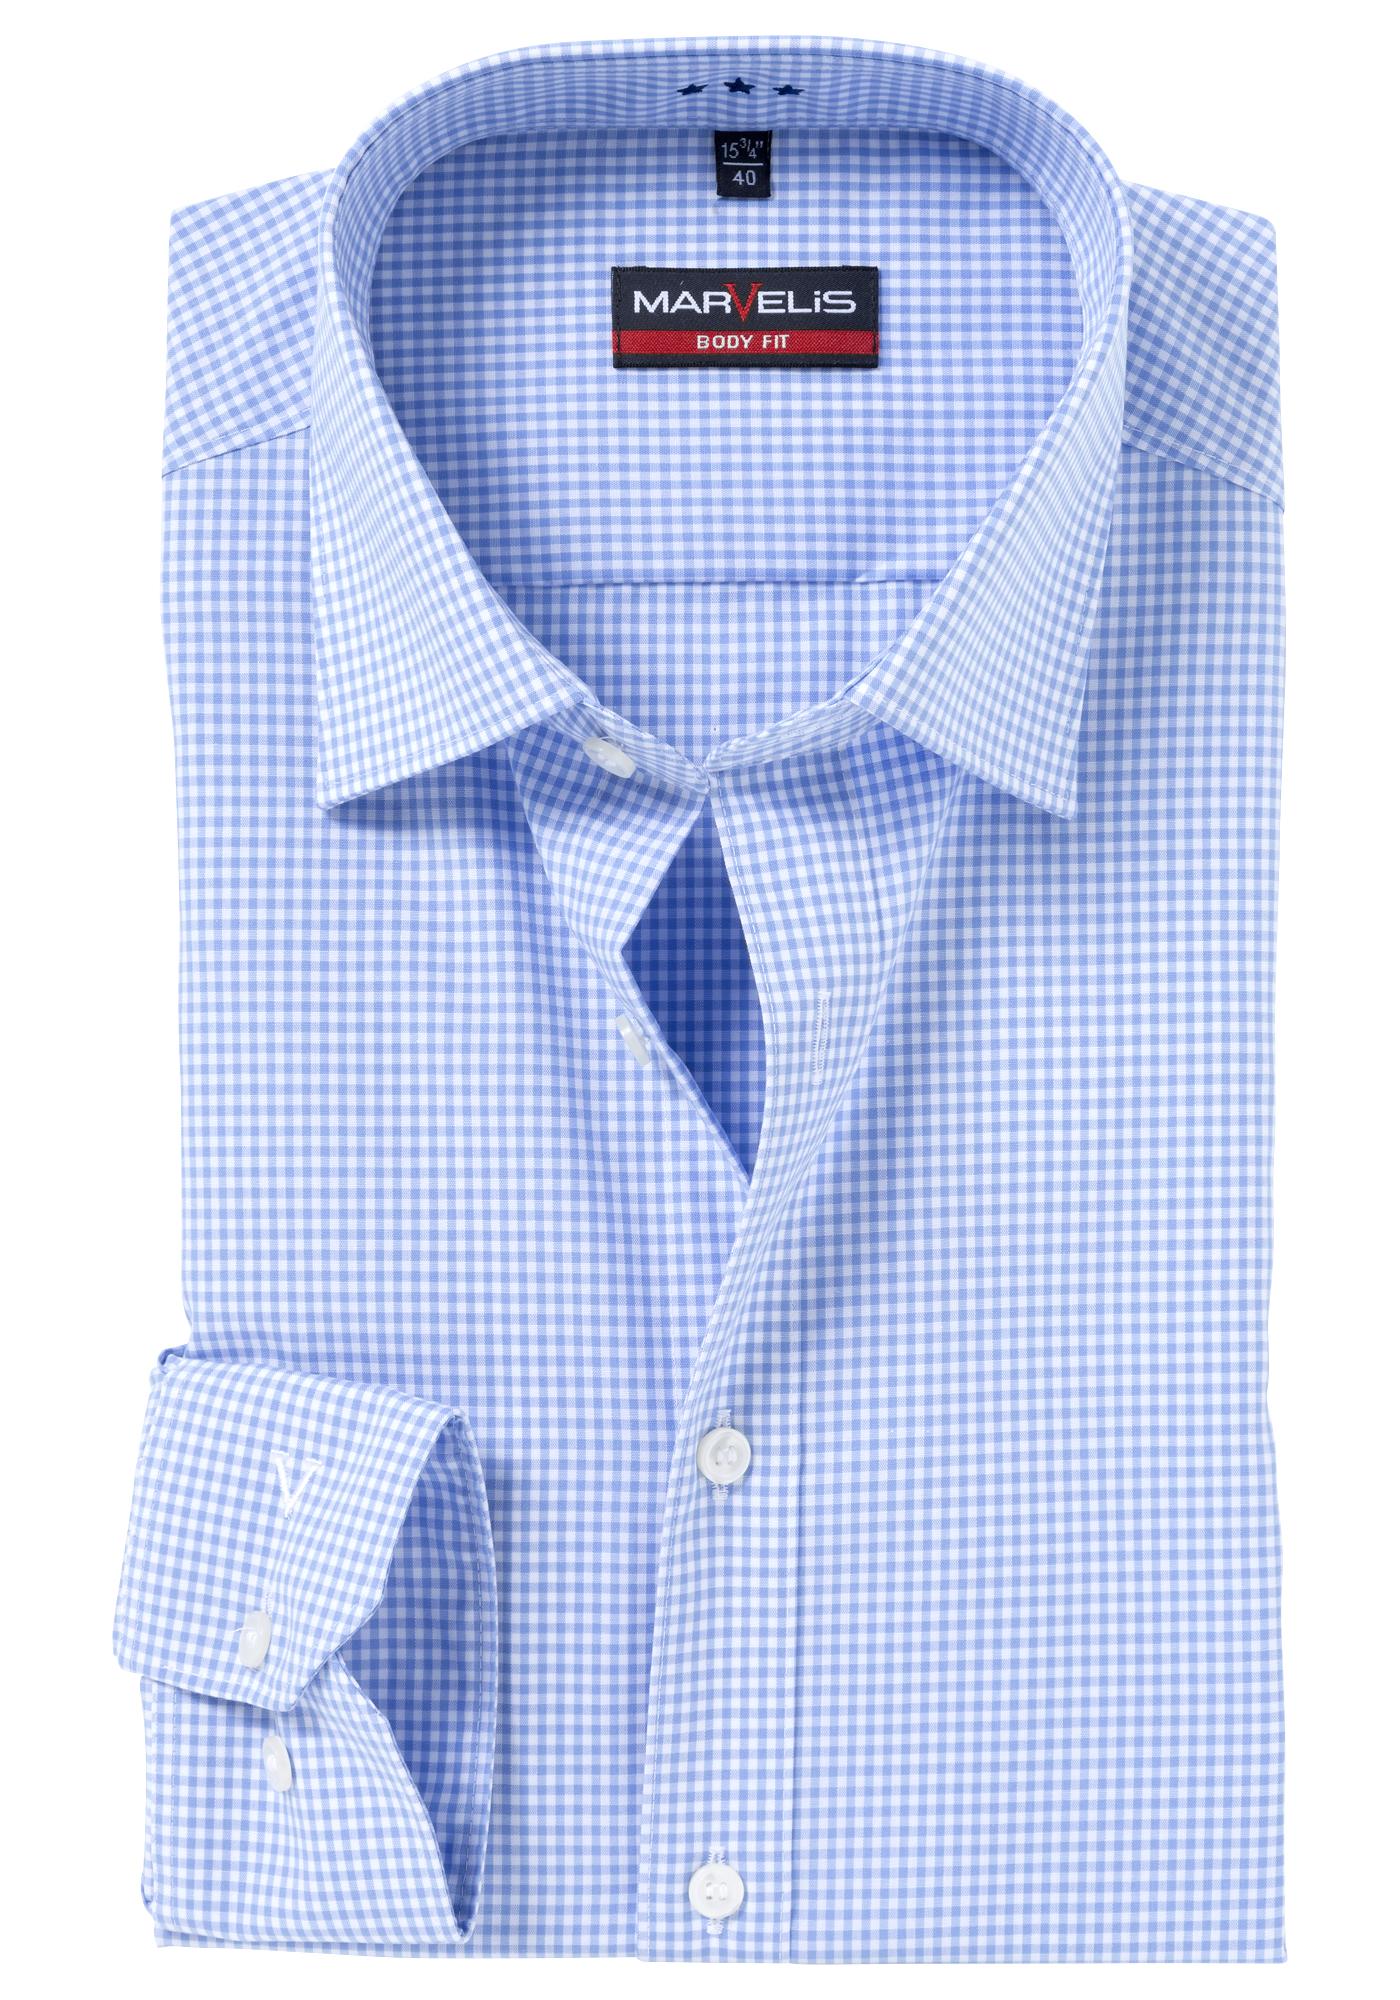 marvelis body fit overhemd blauw wit geruit gratis verzending. Black Bedroom Furniture Sets. Home Design Ideas